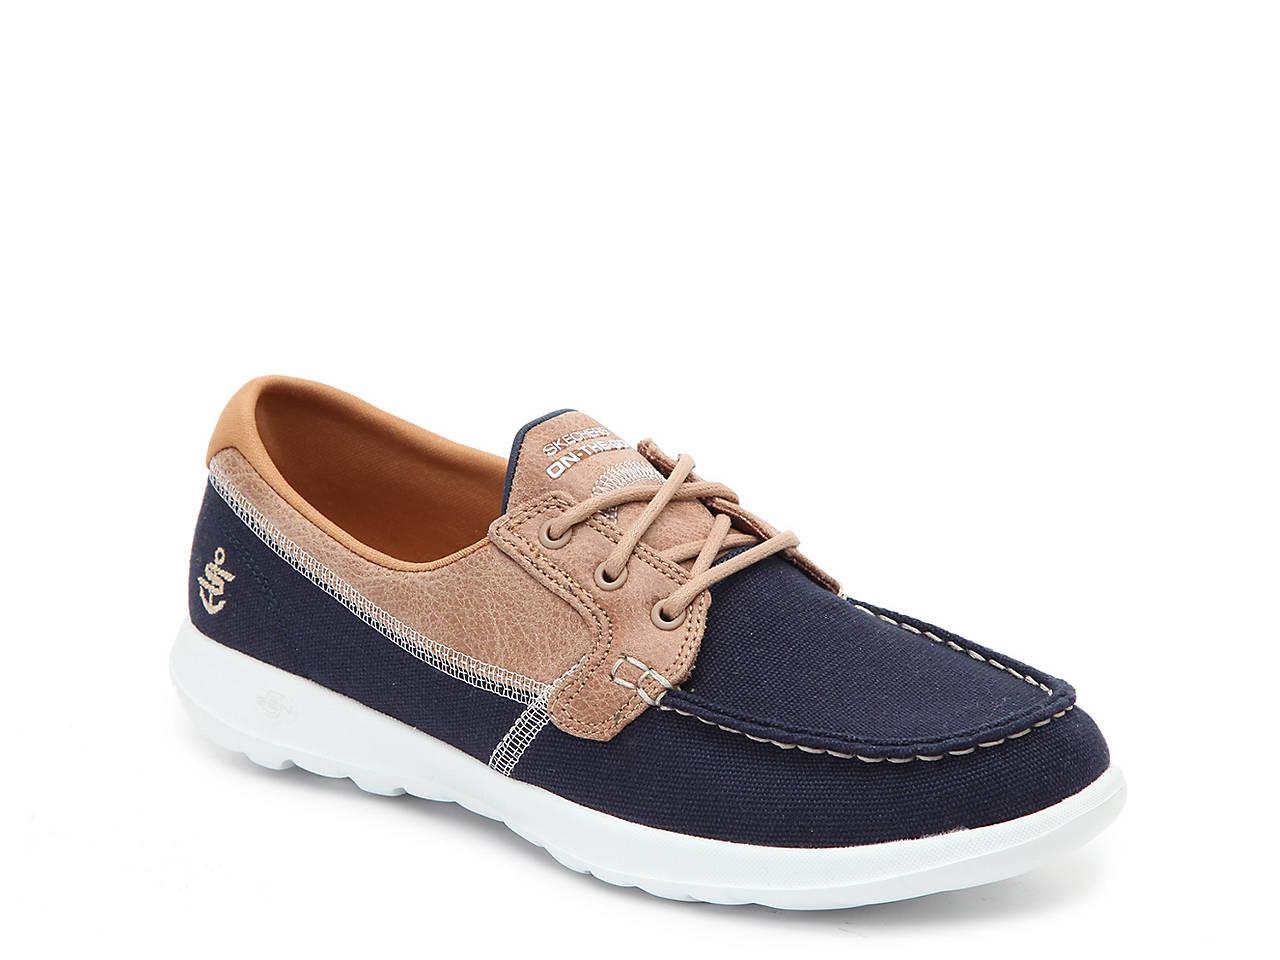 skechers slip on boat shoes